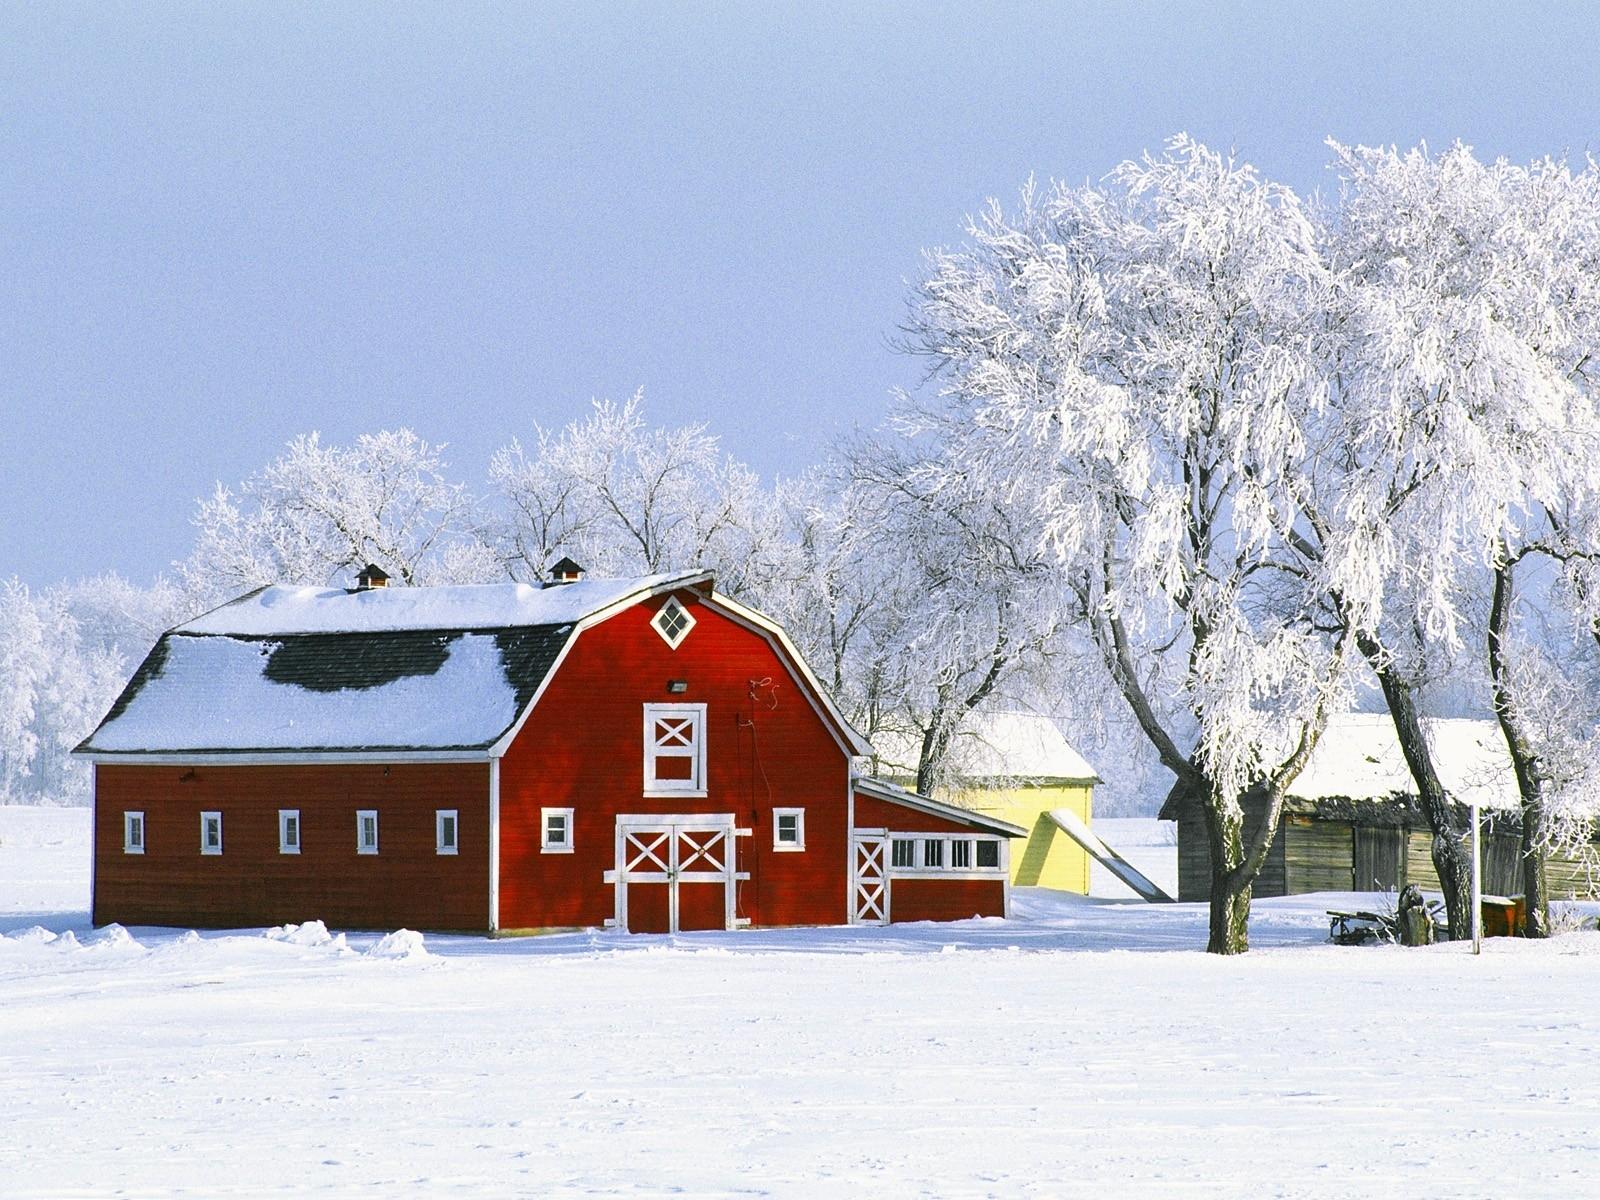 43 winter farm desktop wallpaper on wallpapersafari - Winter farm scenes wallpaper ...